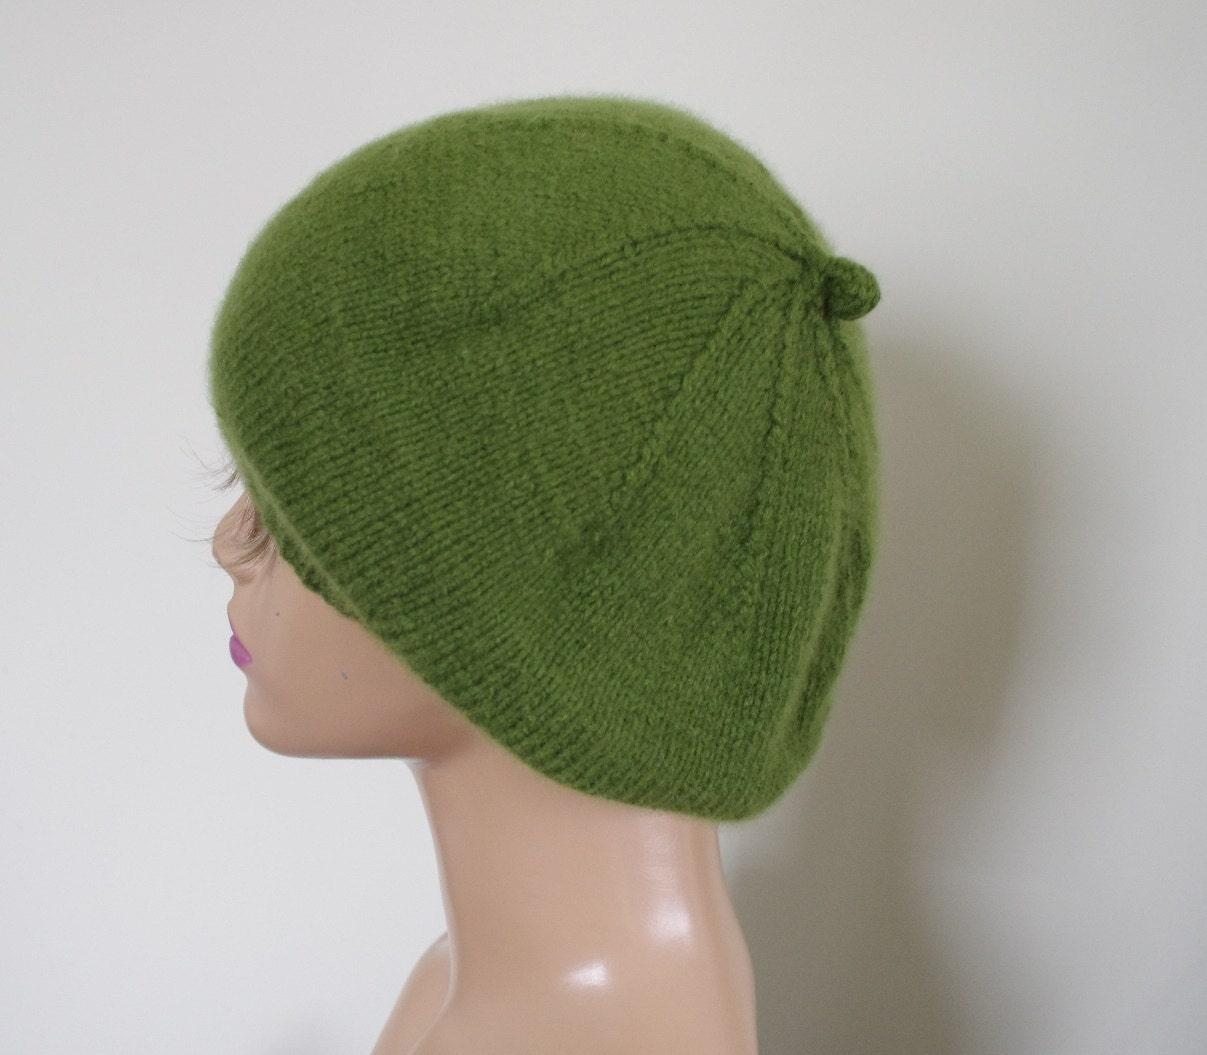 Cashmere Beret Knitting Pattern : Pure Cashmere Grass Green Spring Hand Knit Women Beret Cap